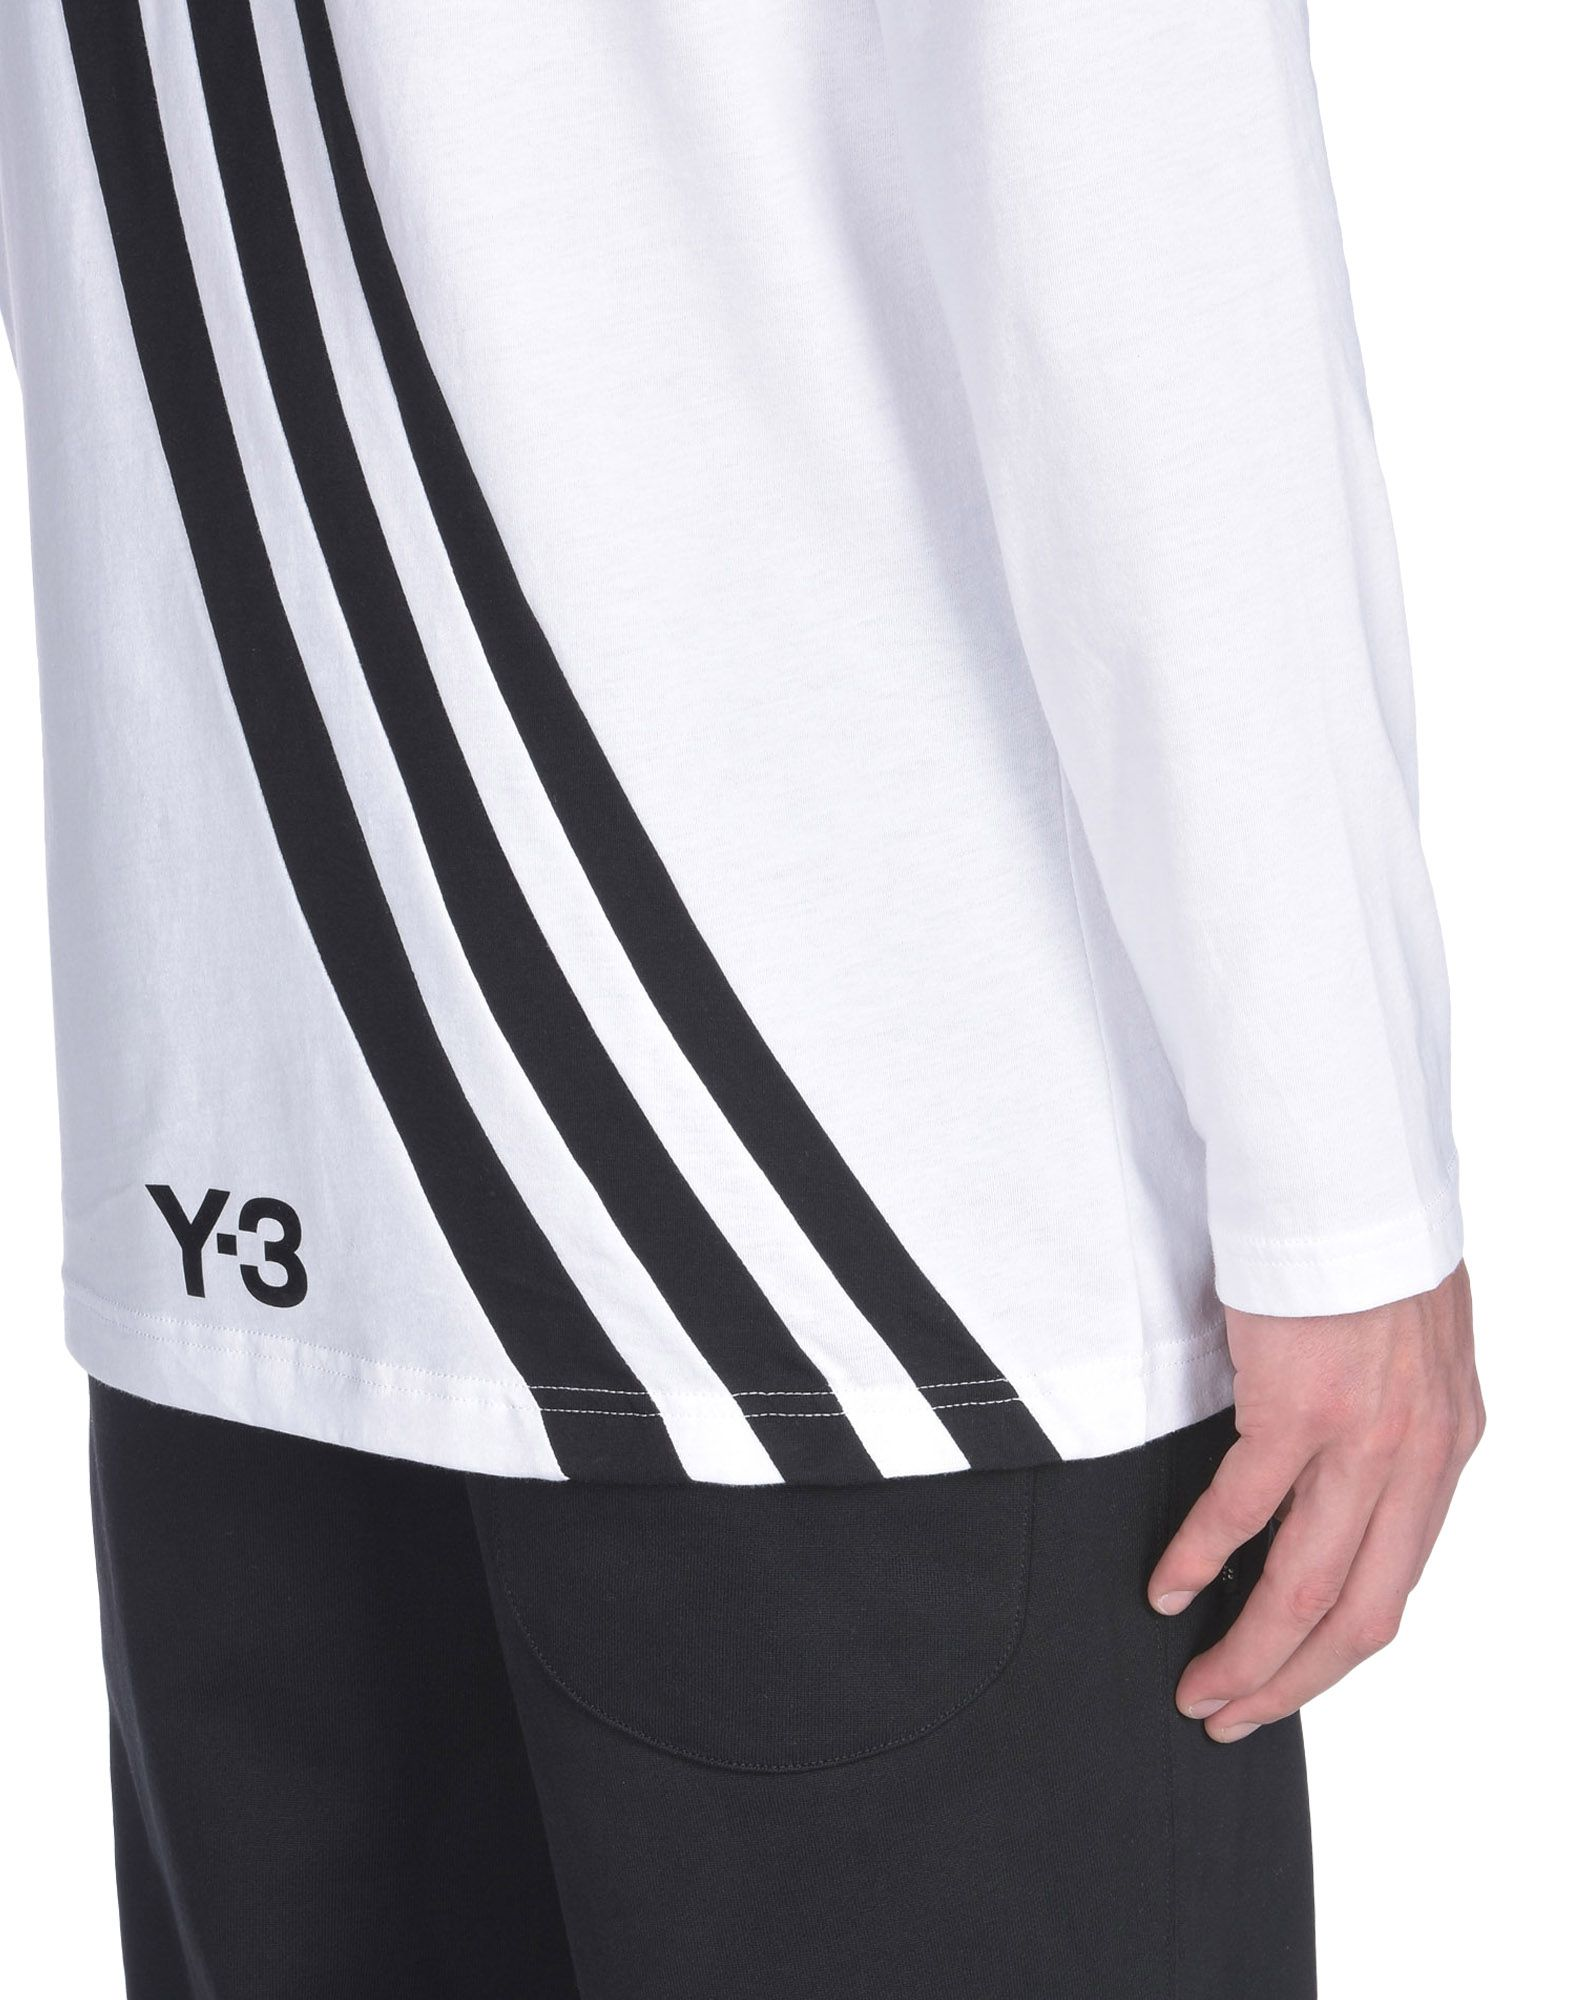 Y-3 3-STRIPES TEE TEES & POLOS man Y-3 adidas